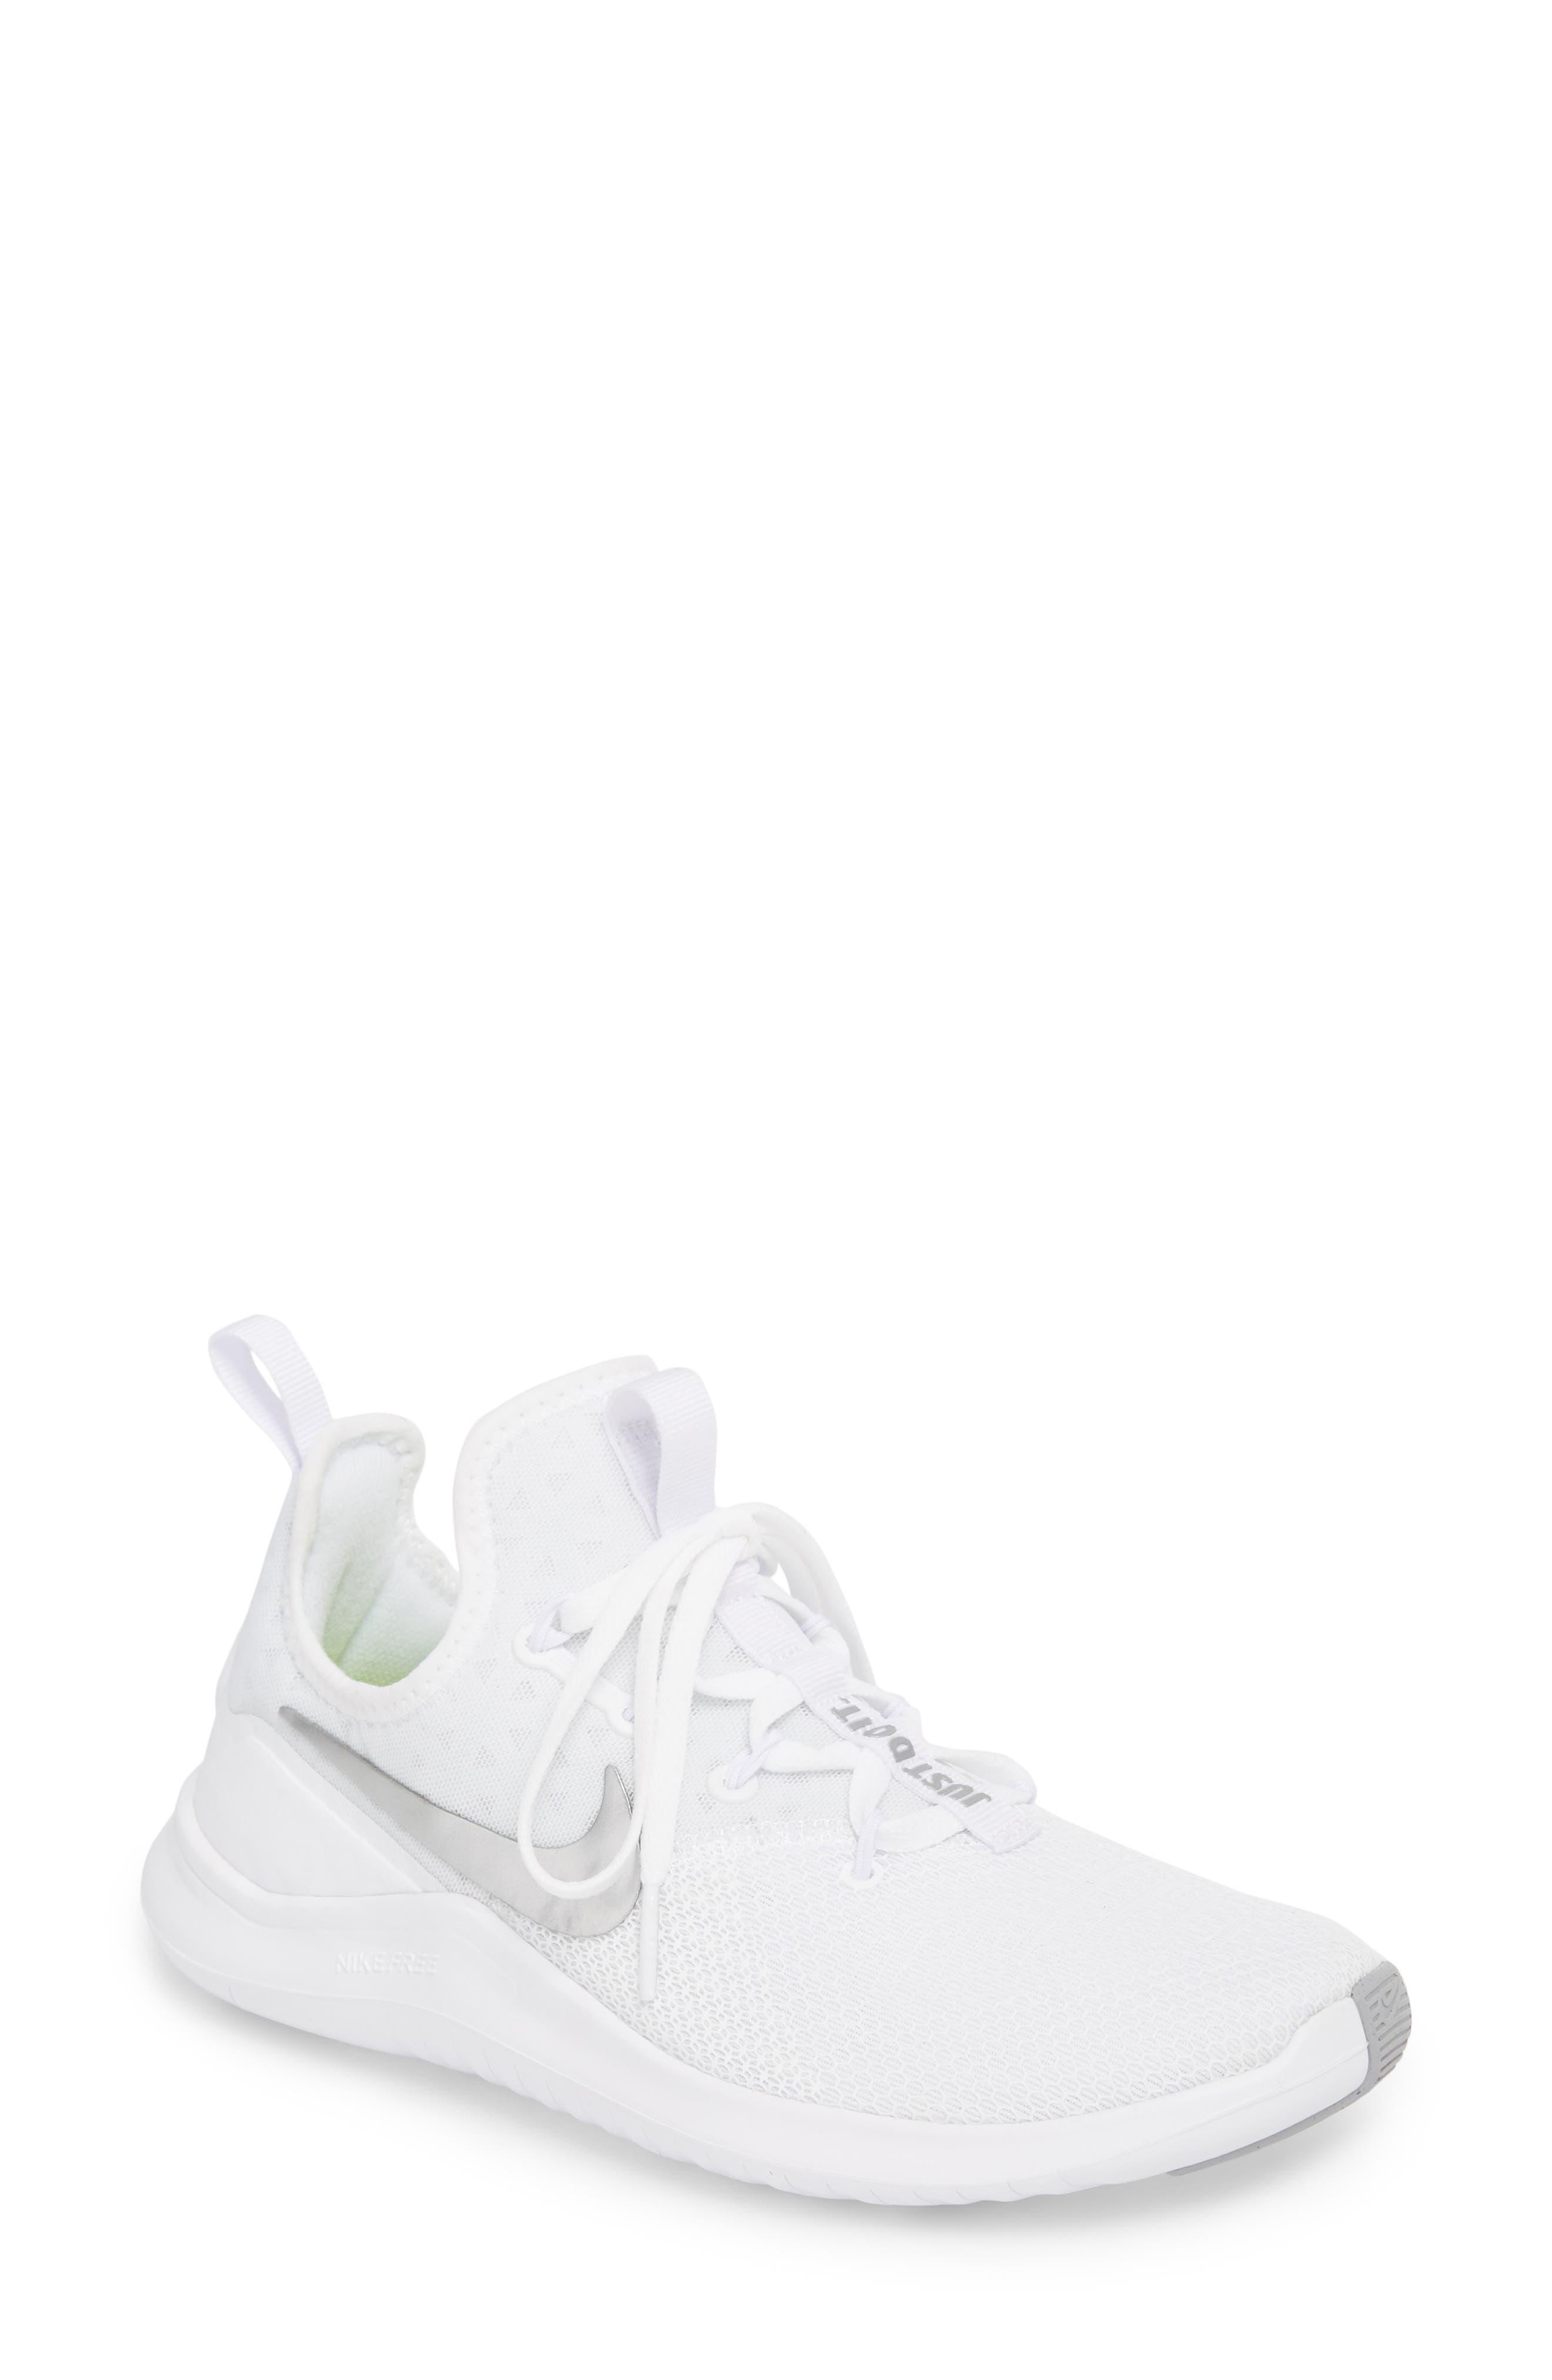 Free TR8 Training Shoe,                         Main,                         color, White/ Metallic Silver/ White